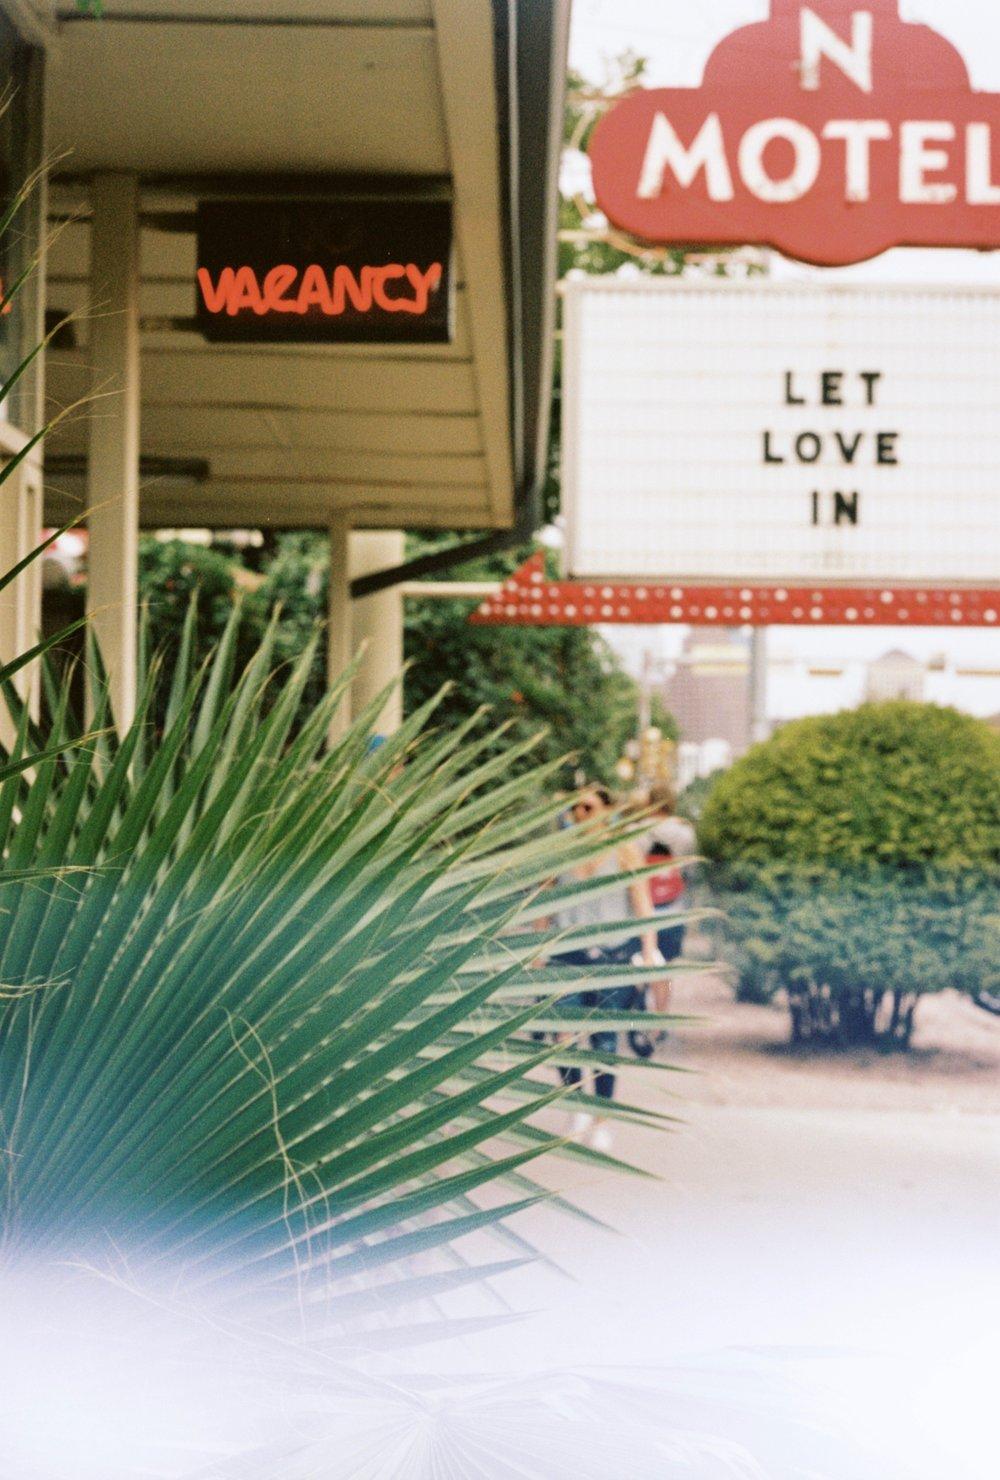 austin motel 2.jpg